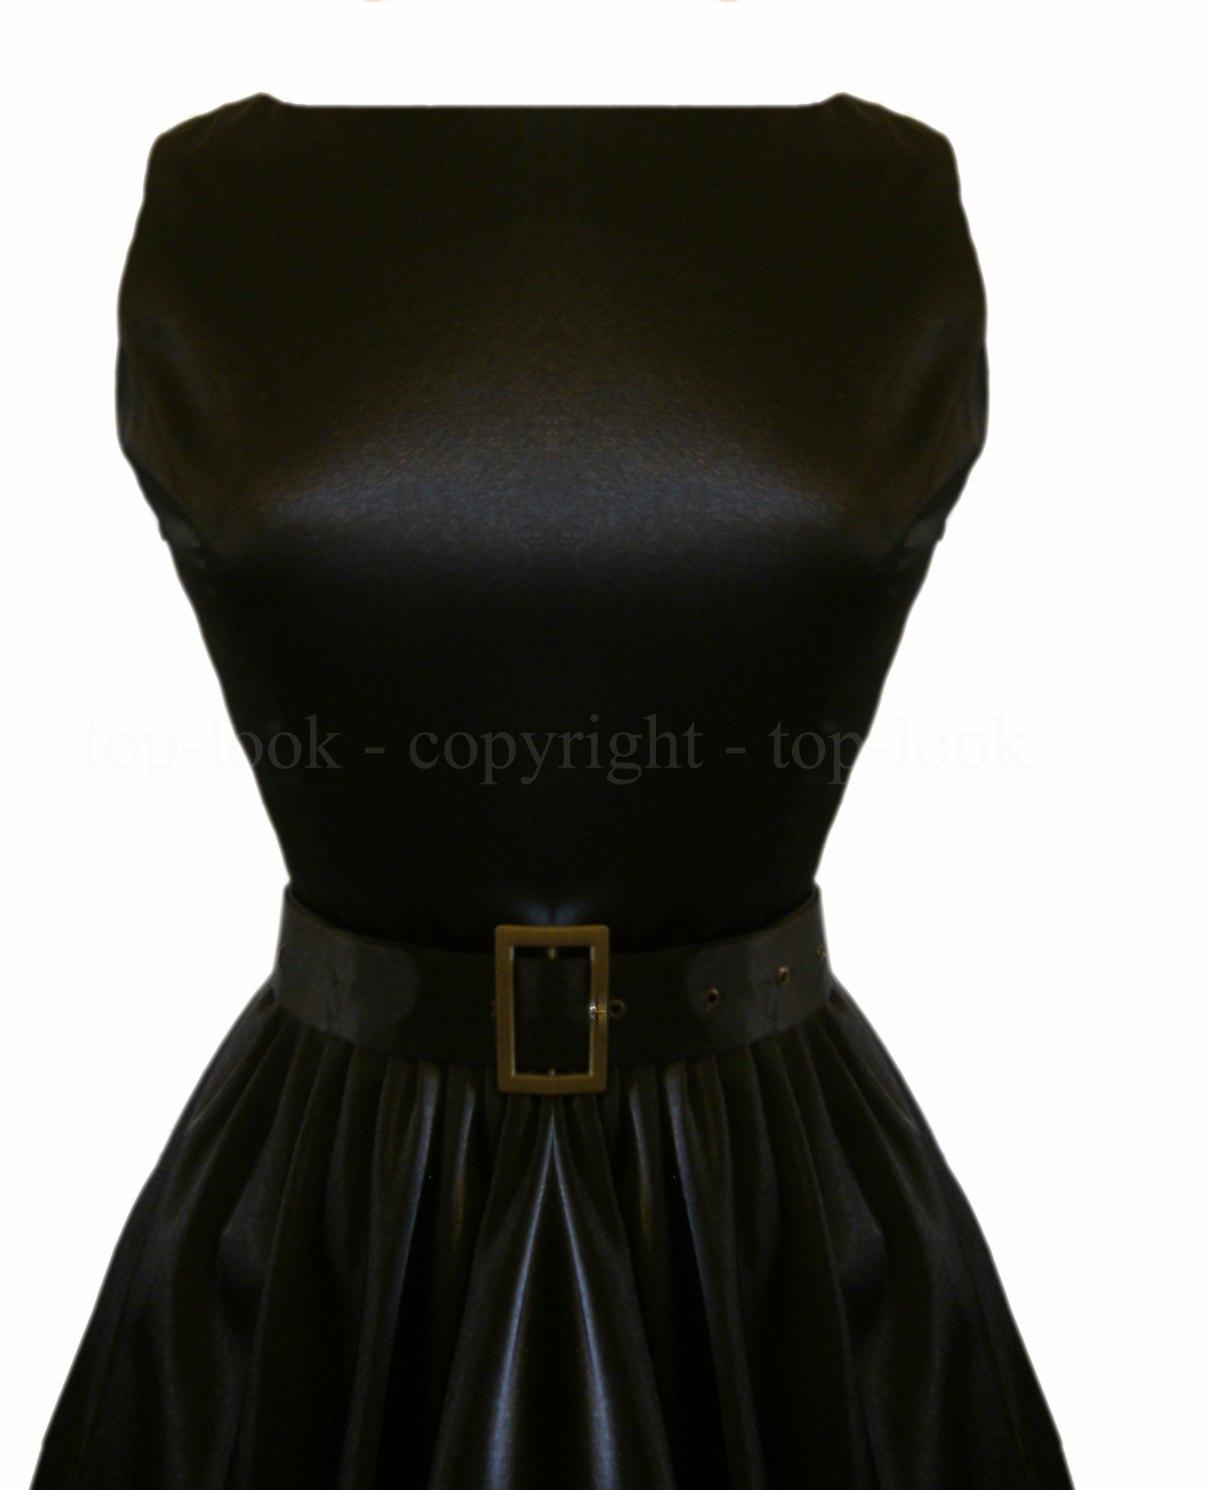 Enlarge Audrey Hepburn Dress